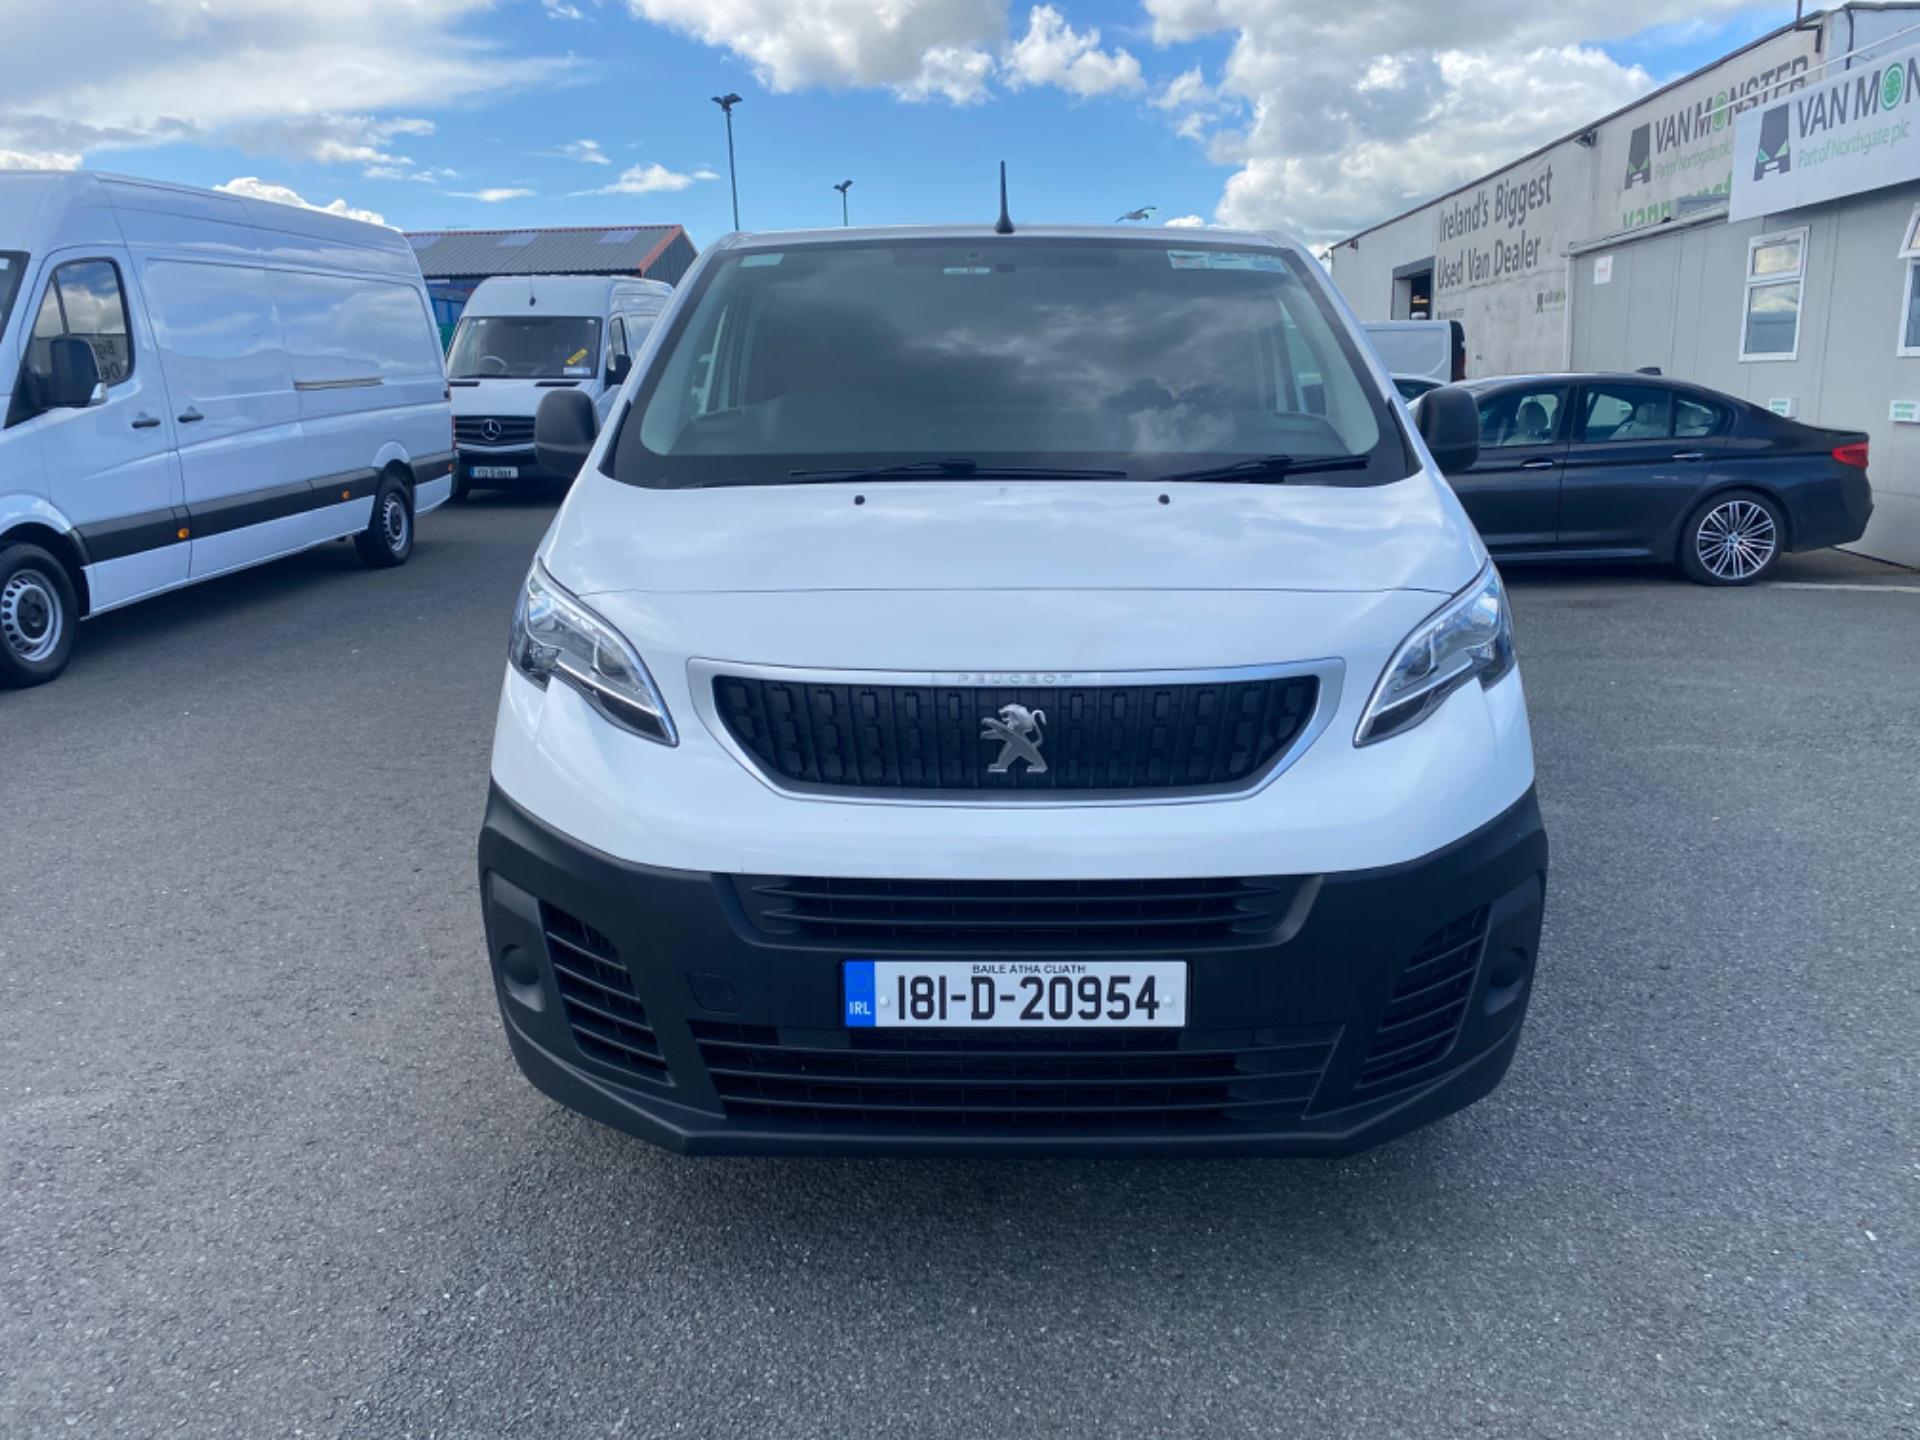 2018 Peugeot Expert Active Standard 1.6 Blue HDI 9 (181D20954) Image 2